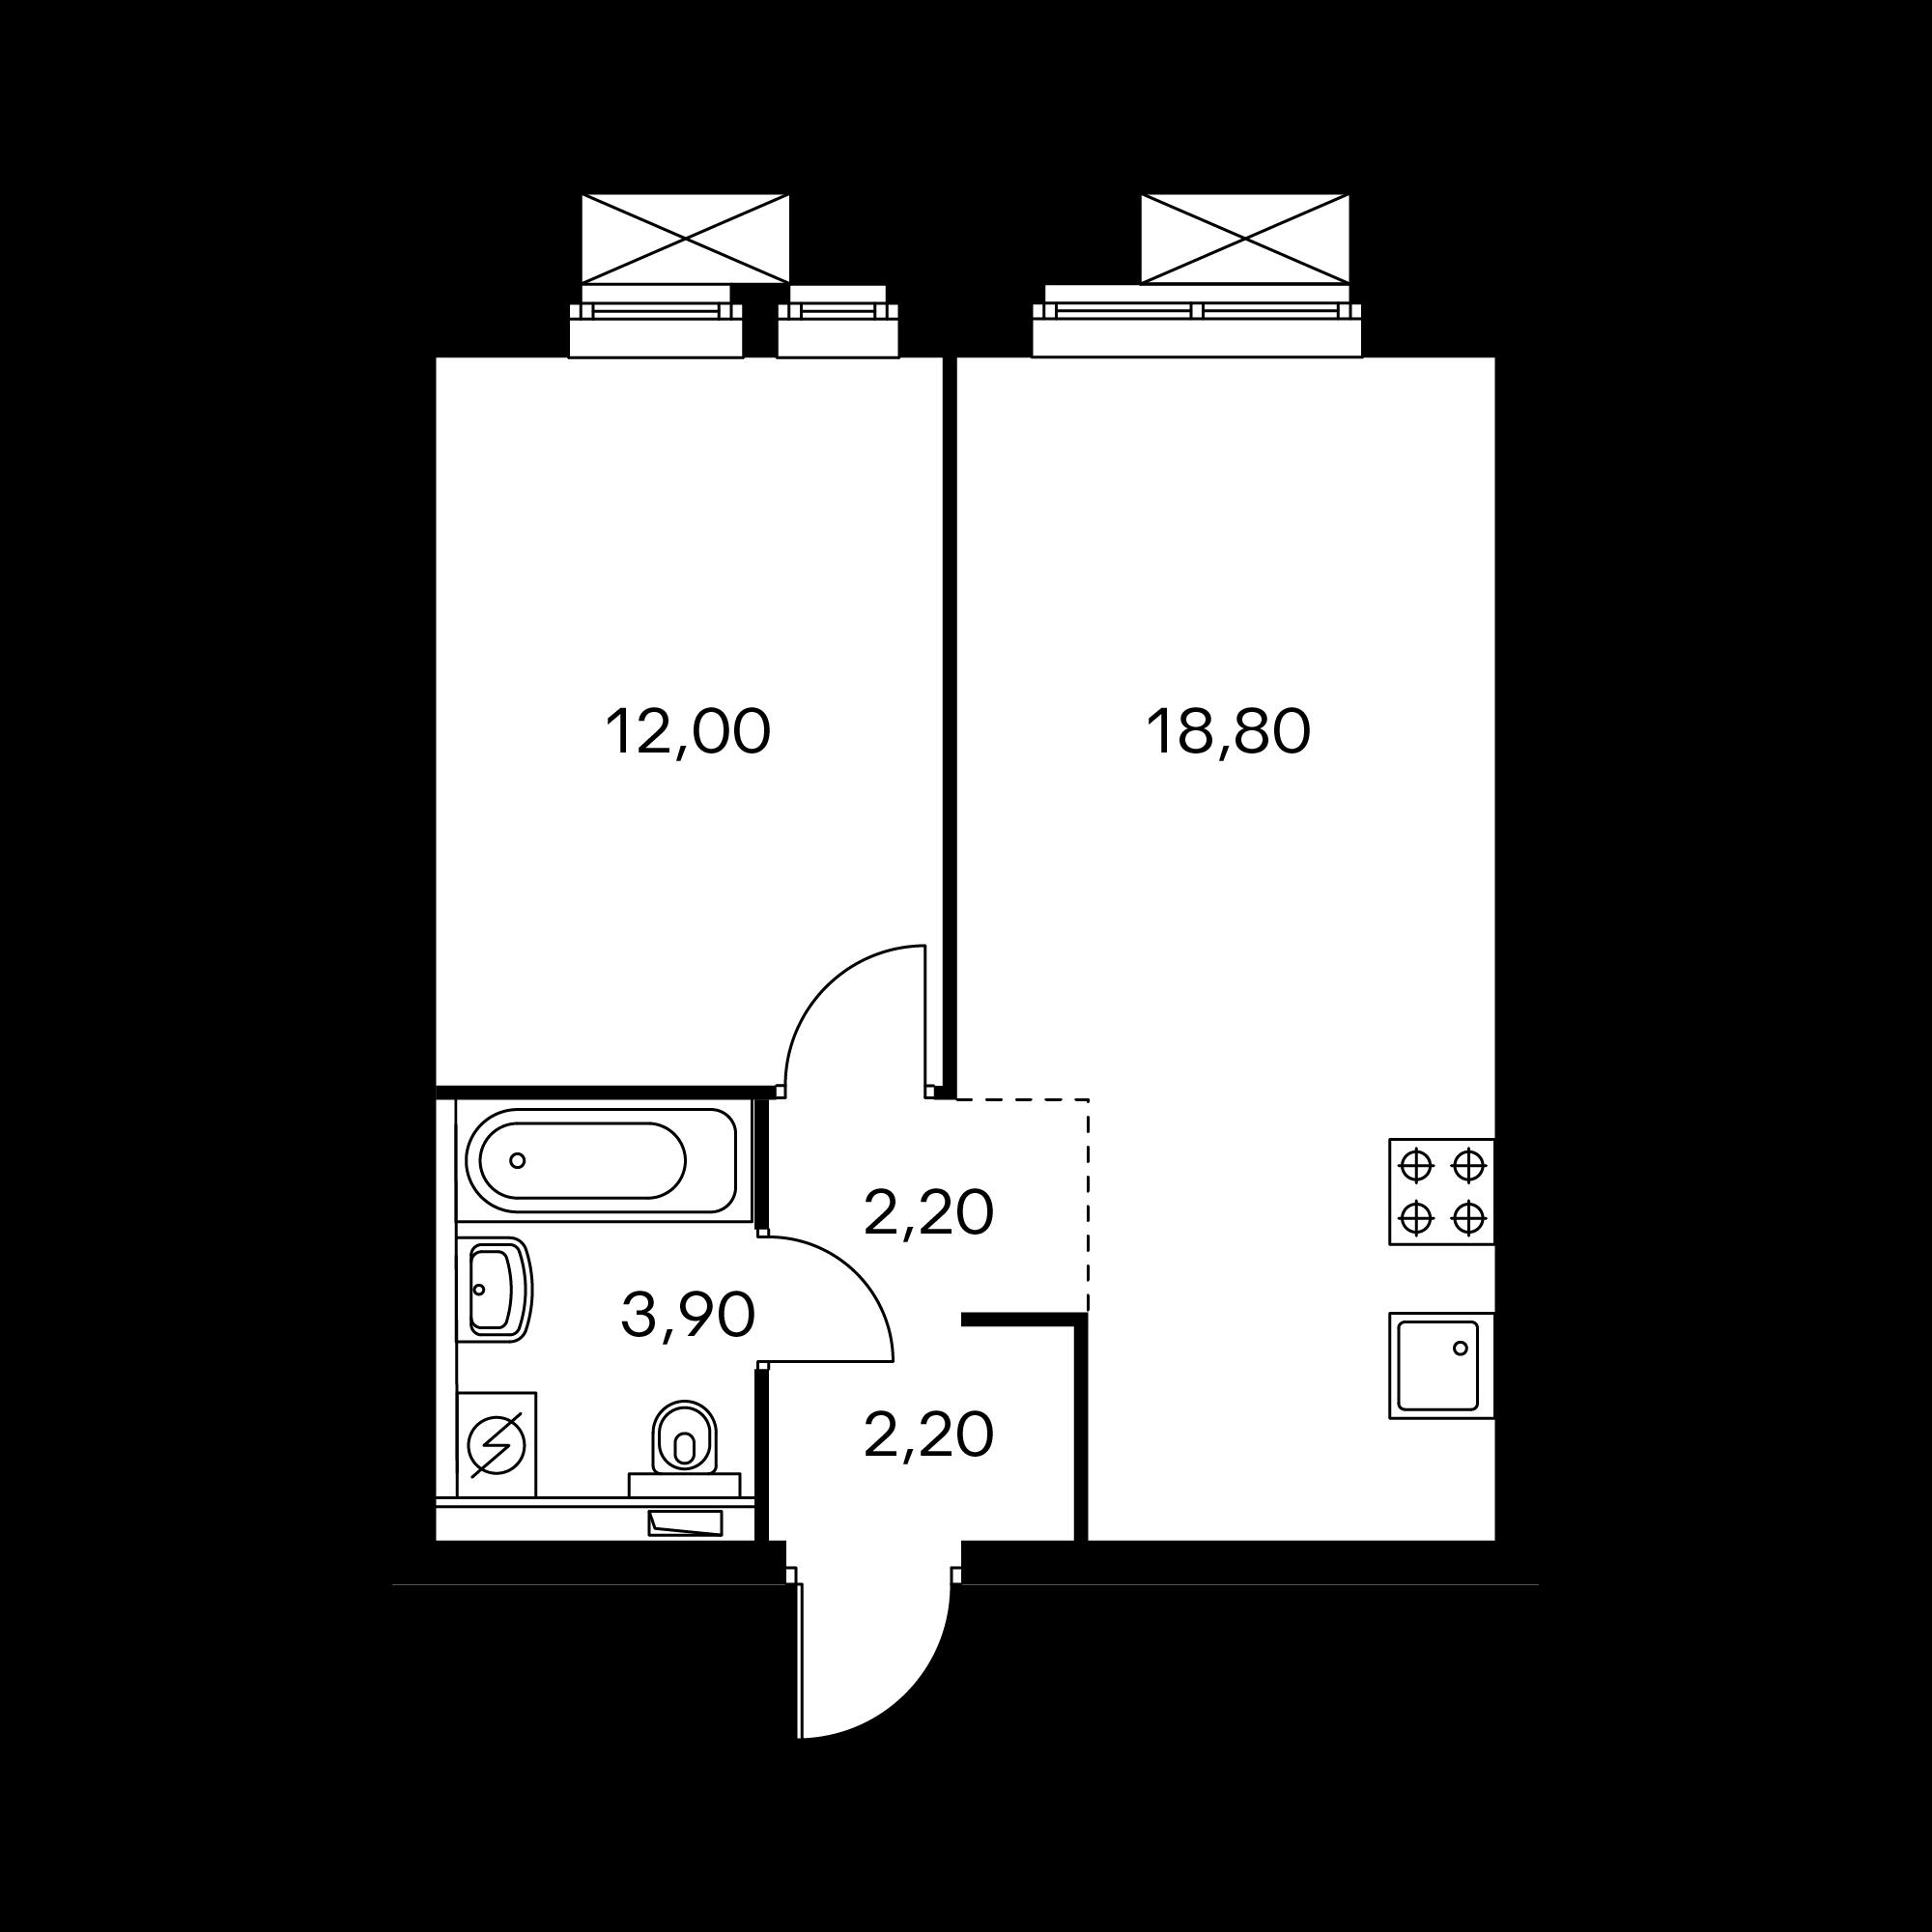 1EM1_6.3